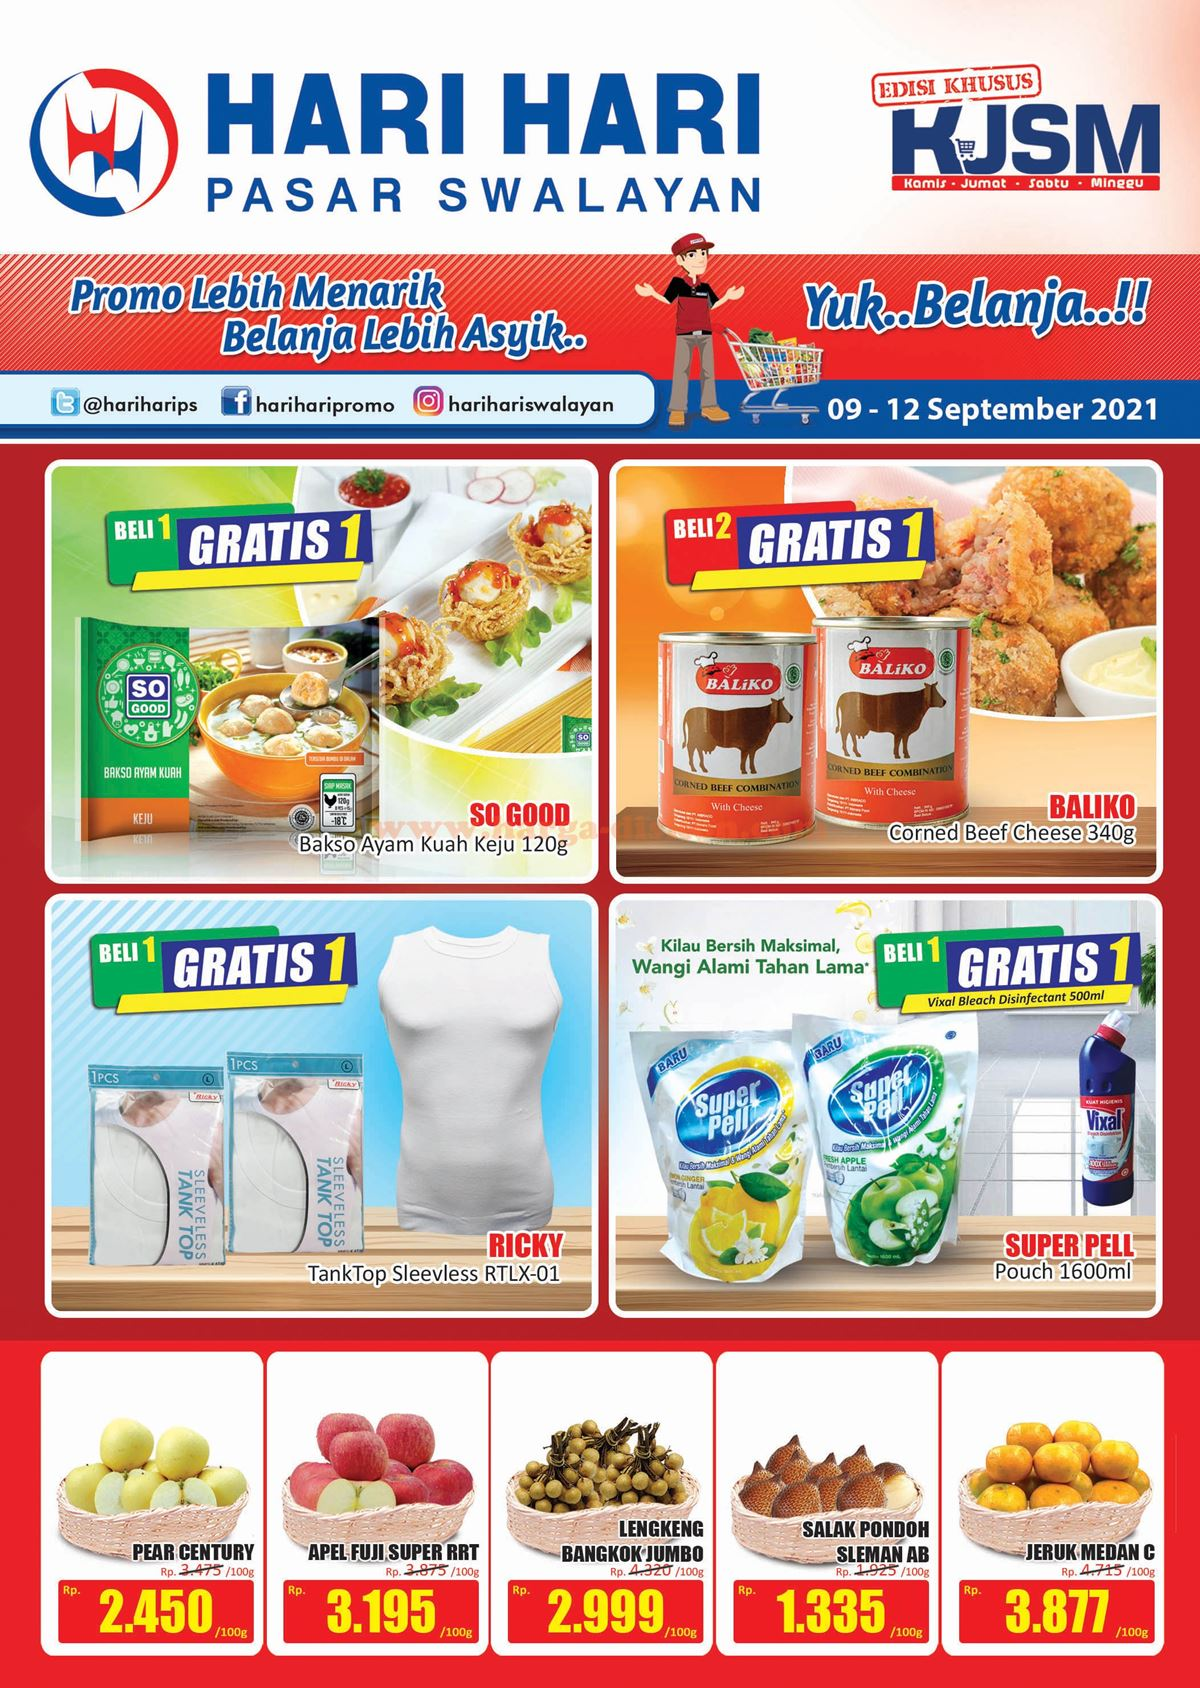 Promo HARI HARI Akhir Pekan Weekend Promo KJSM 09 - 12 September 2021